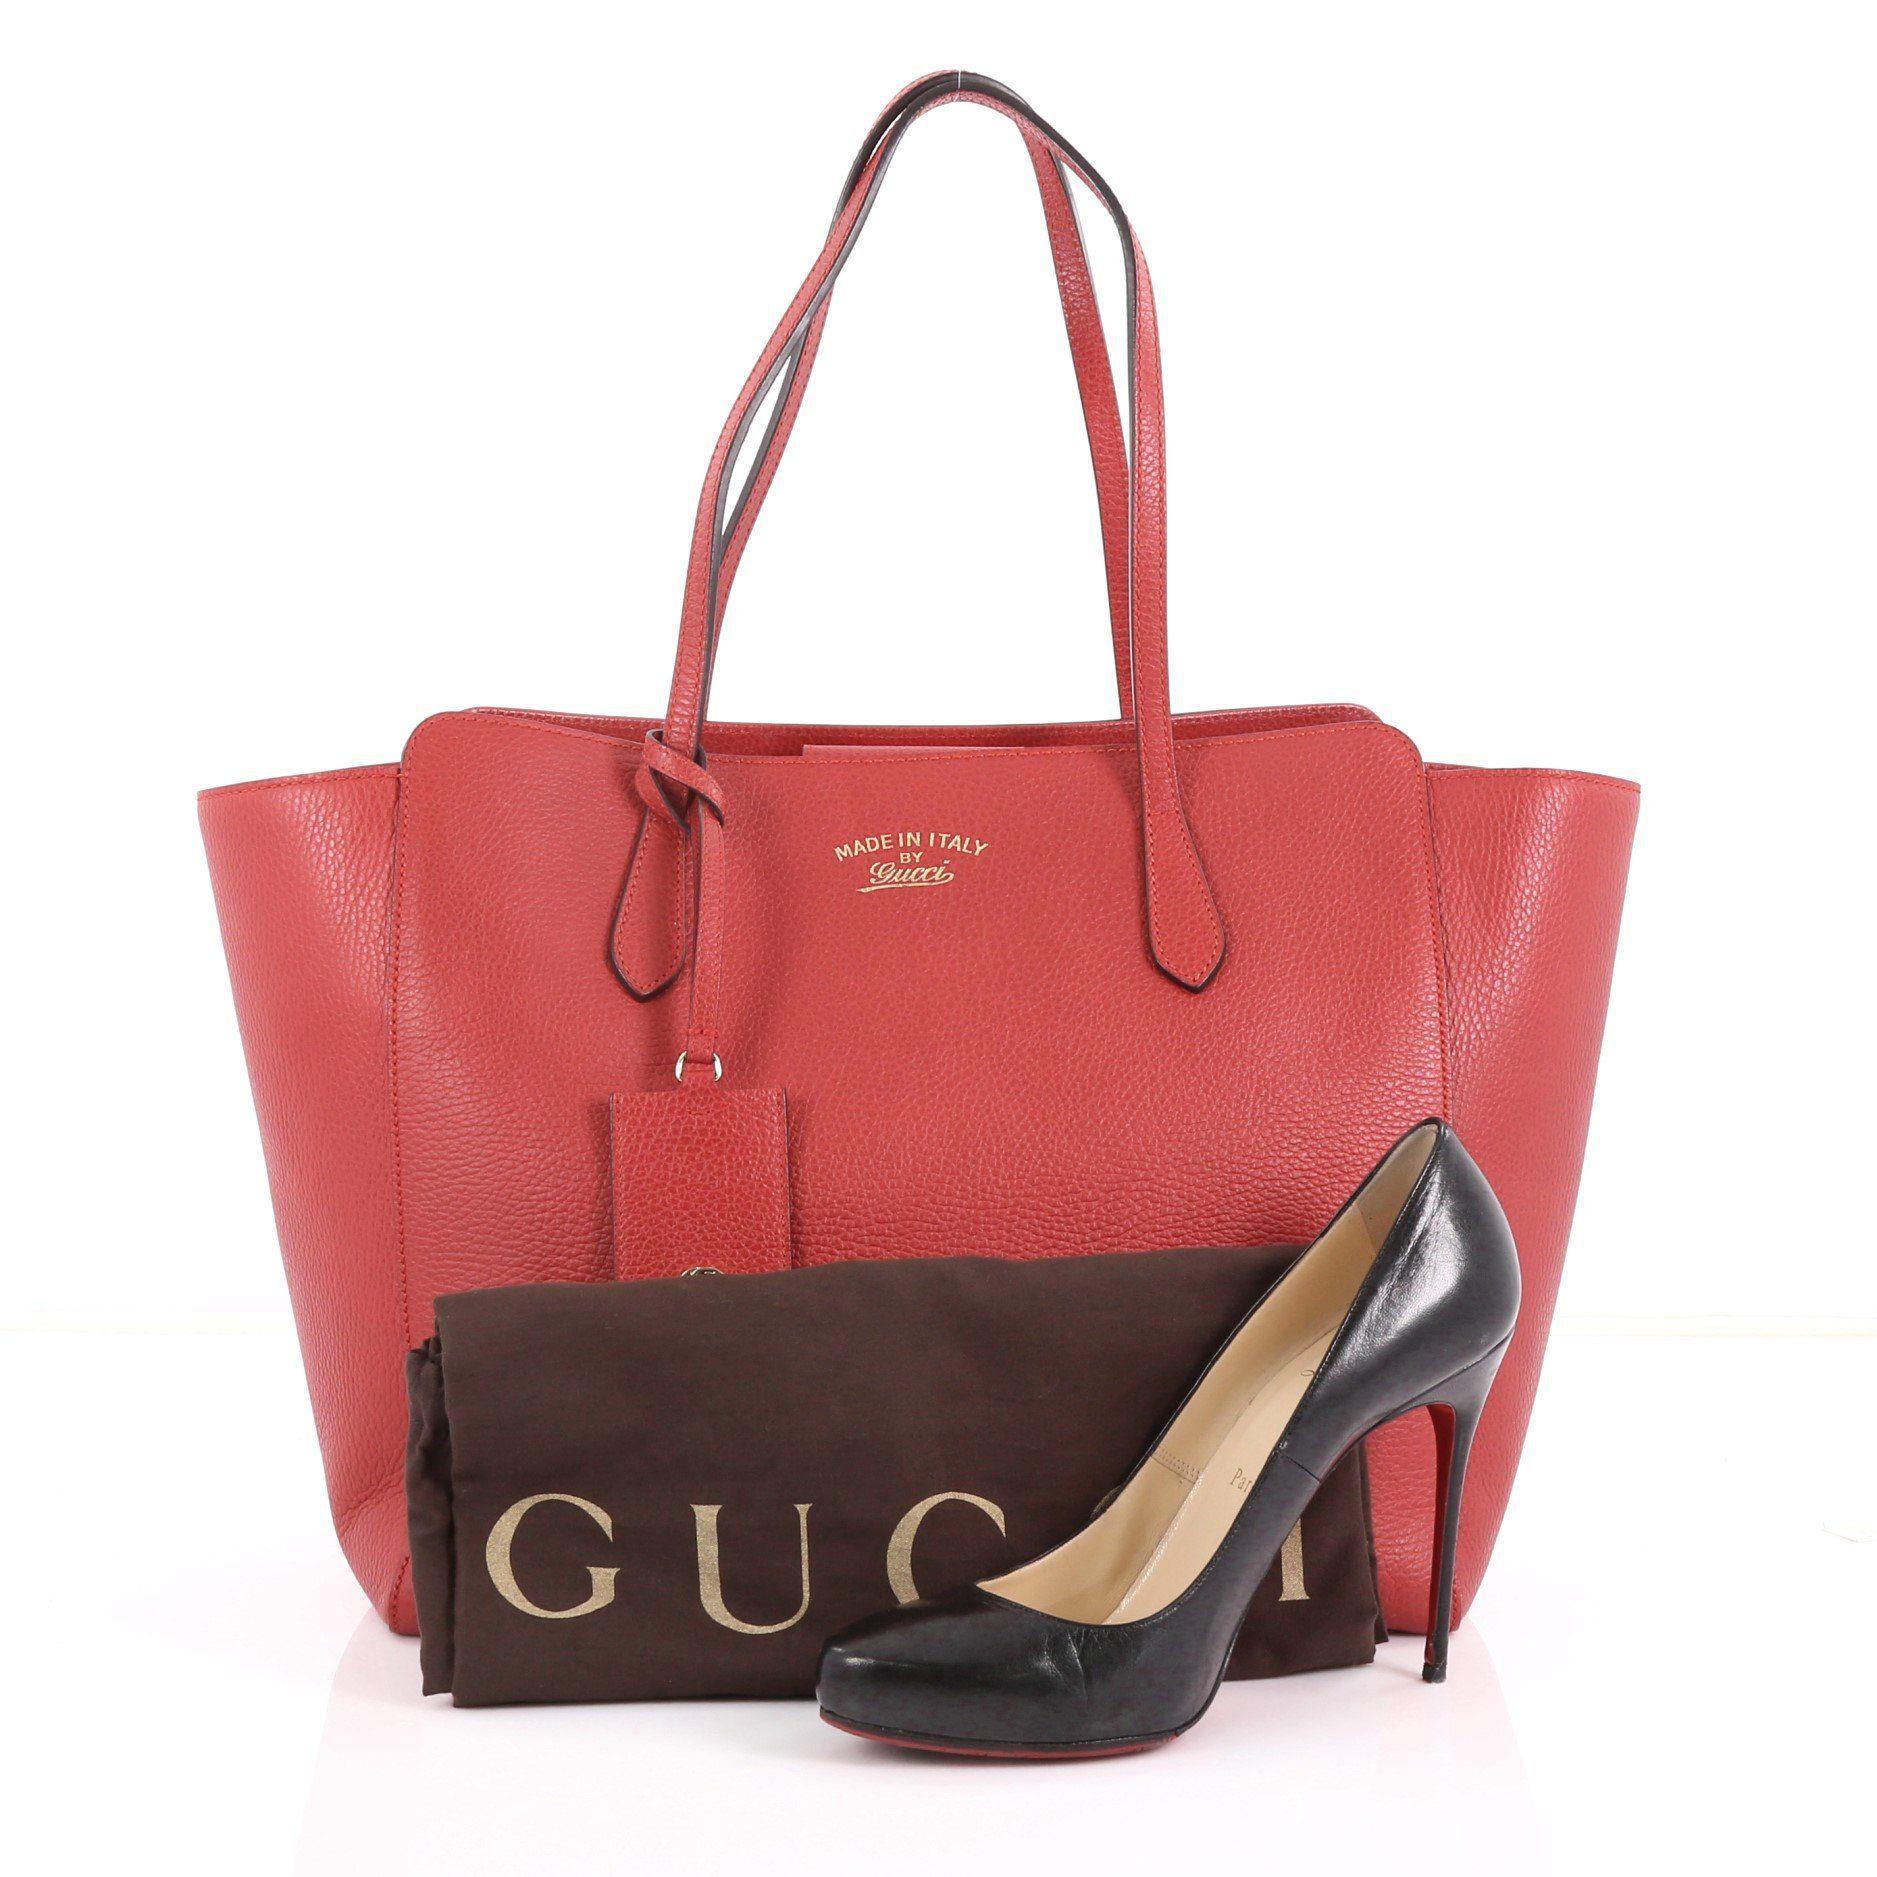 99cc68861e6e Gucci - Red Pre Owned Swing Tote Leather Medium - Lyst. View fullscreen